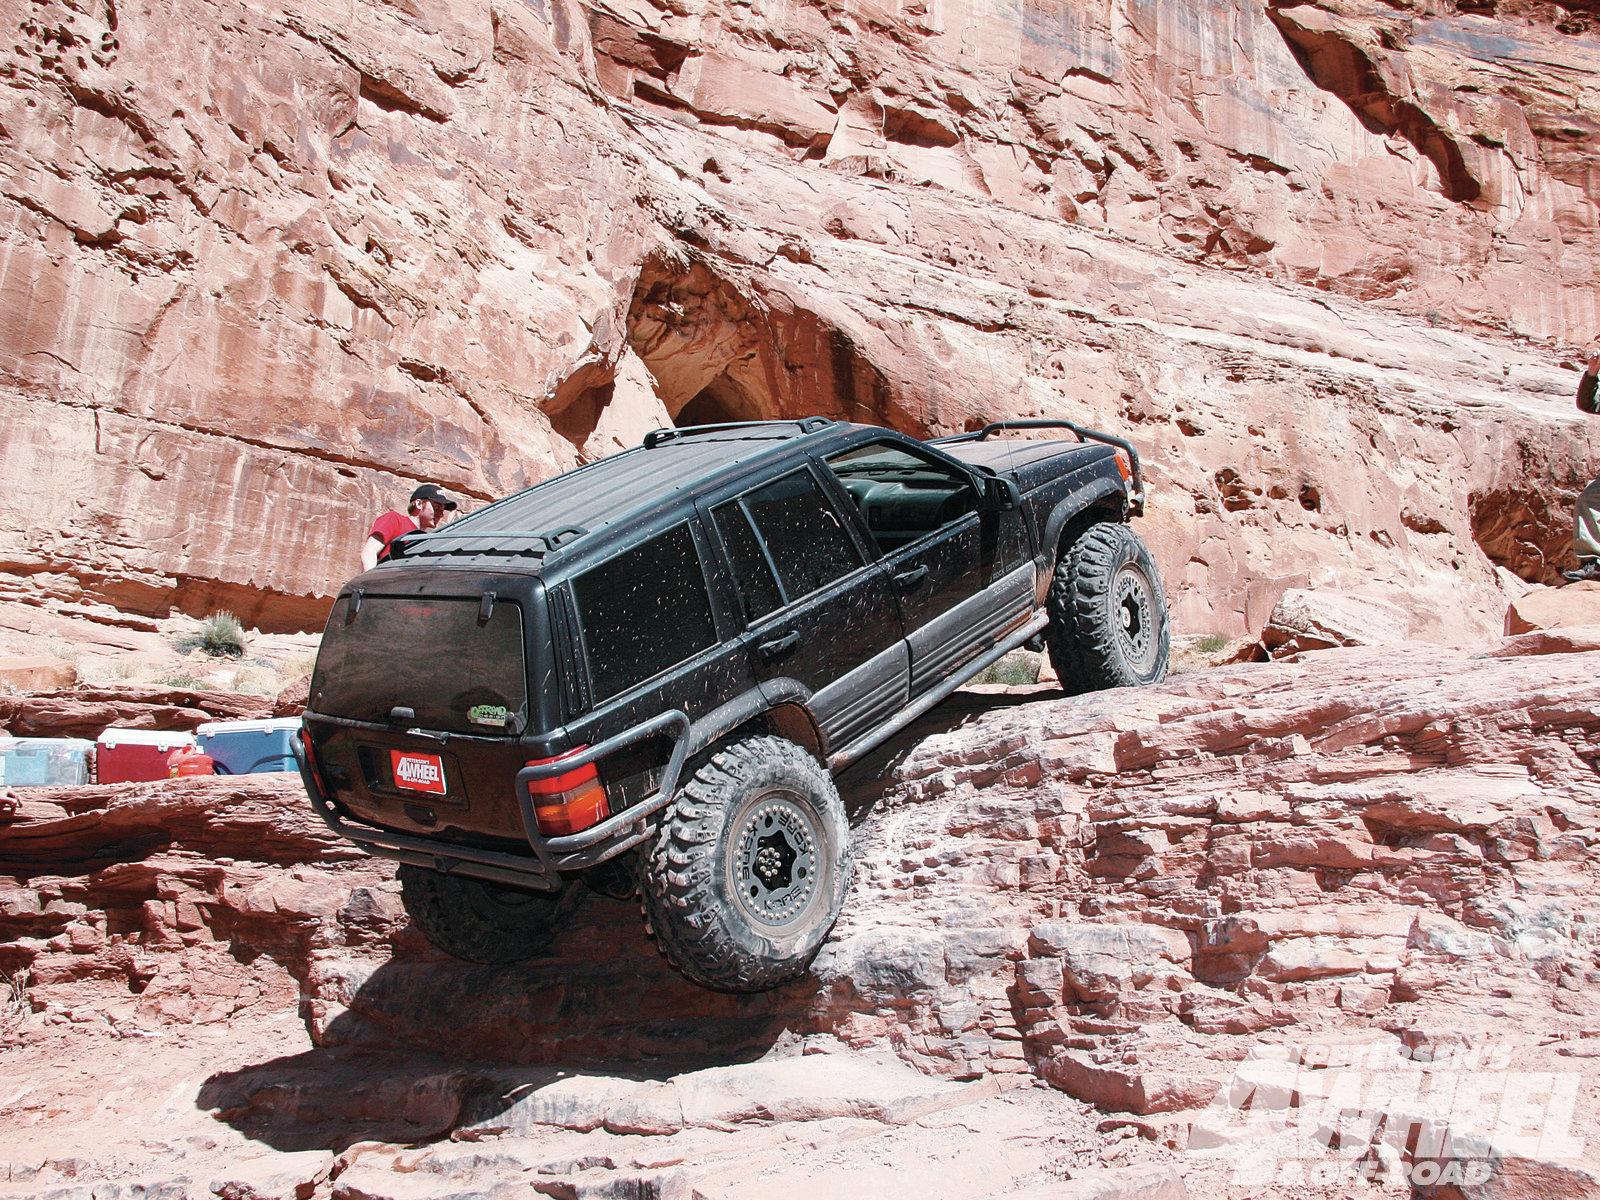 Jeep Grand Cherokee ZJ photos #8 on Better Parts LTD